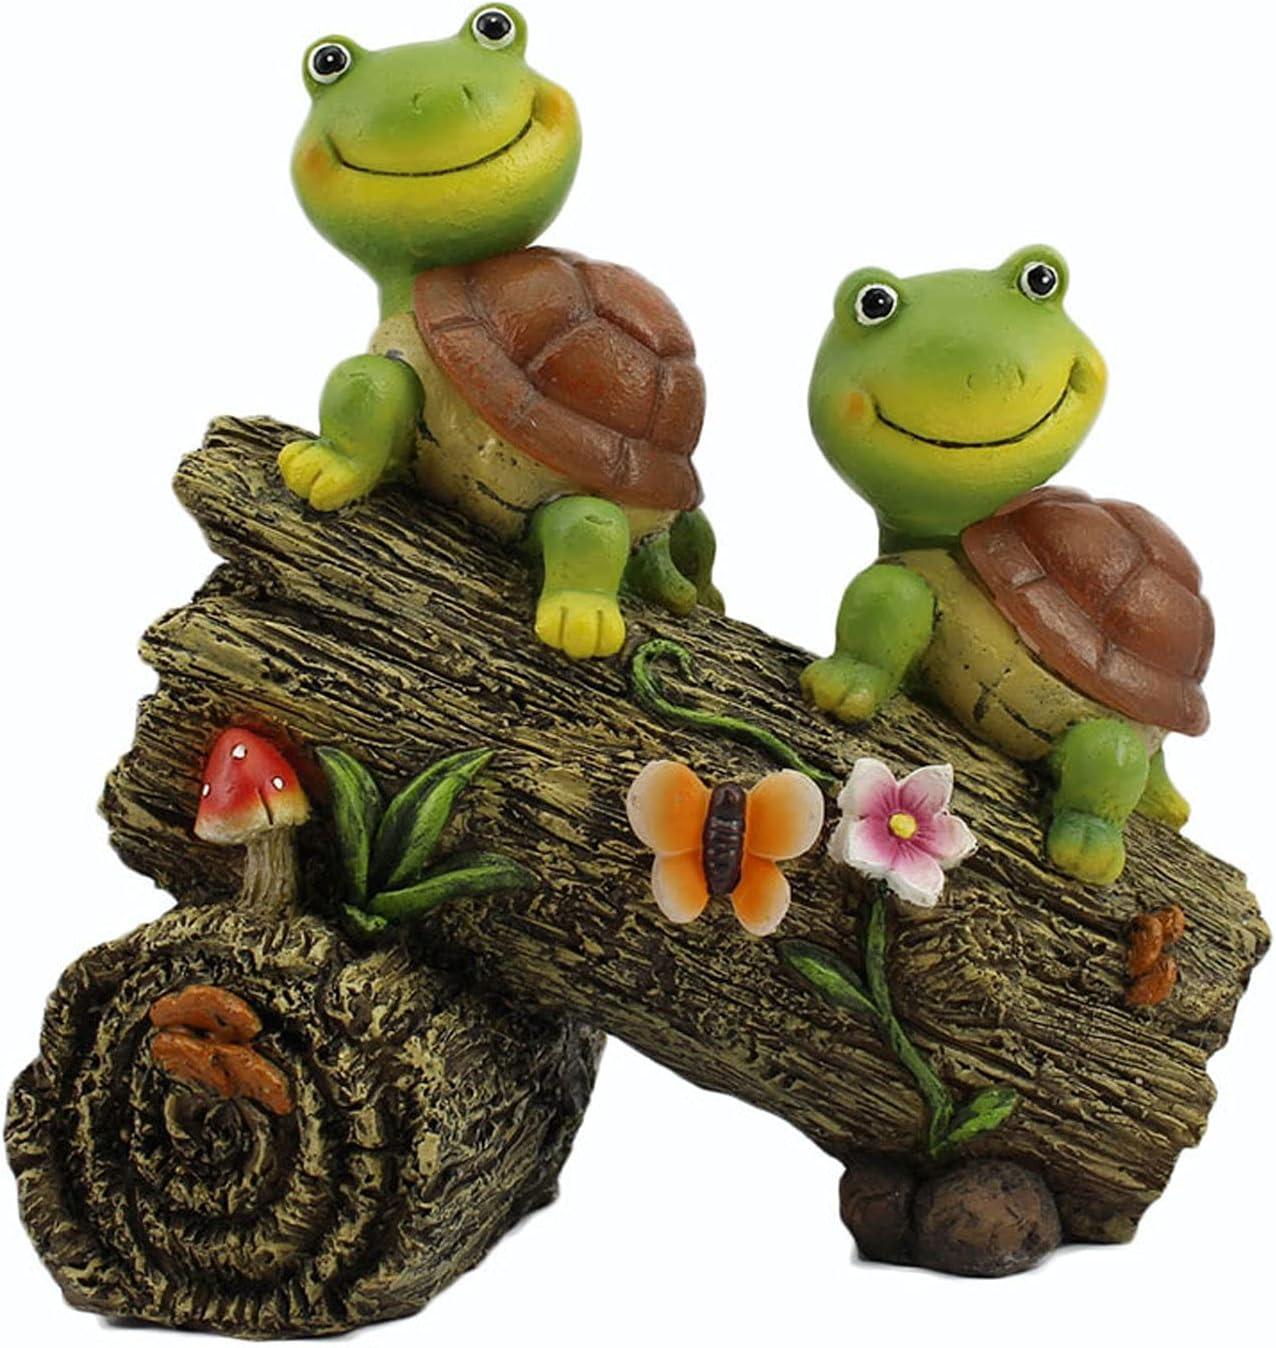 NARUJUBU Turtle Garden Statue Outdoor Turtl Max 83% OFF San Antonio Mall Decor Premium Resin